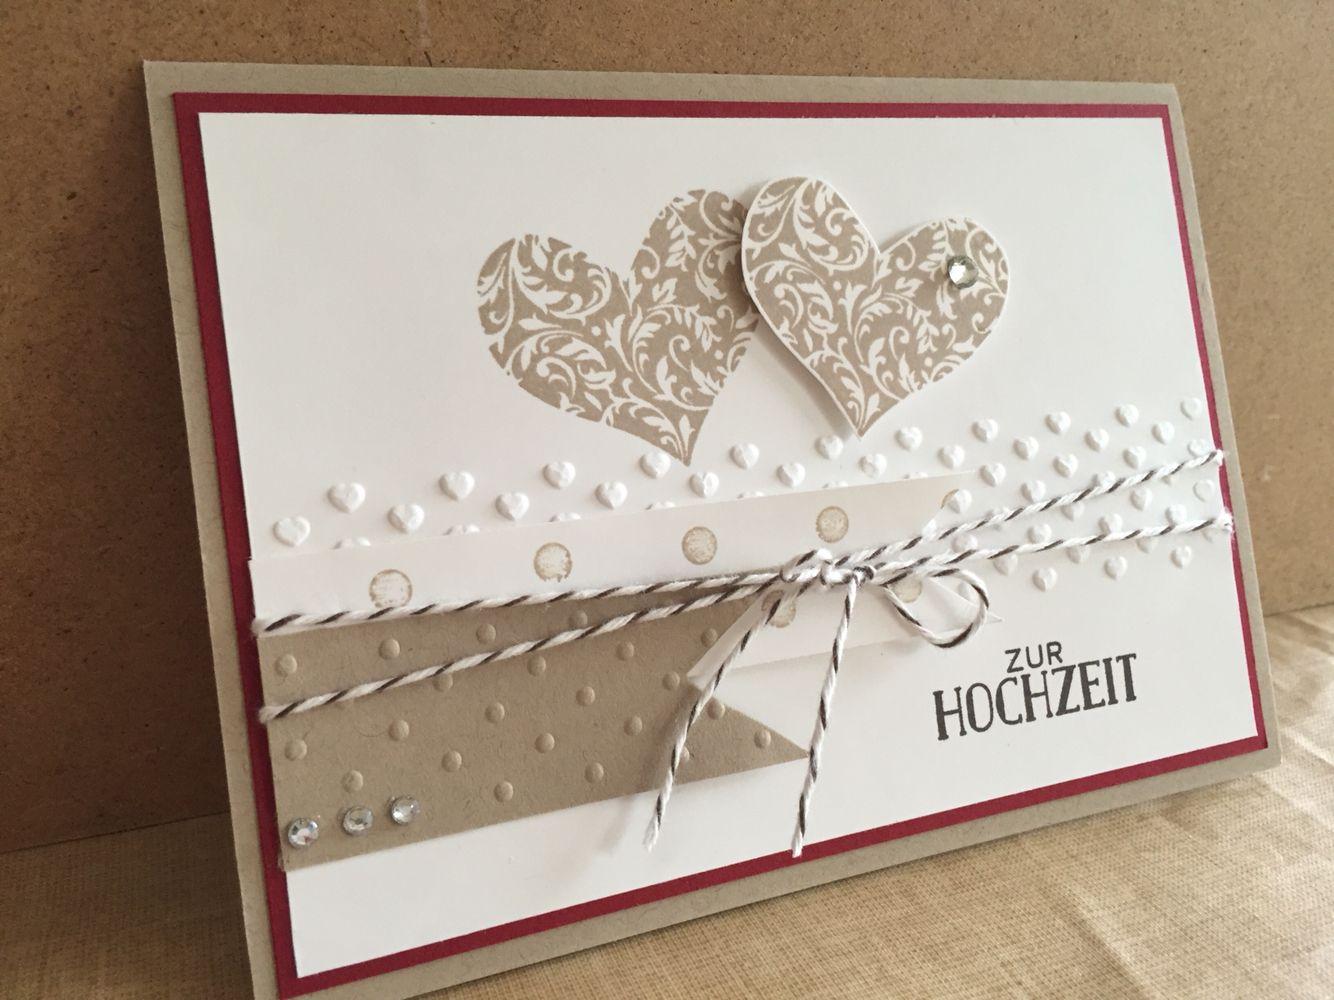 herzklopfen stampin up wedding cards wedding. Black Bedroom Furniture Sets. Home Design Ideas